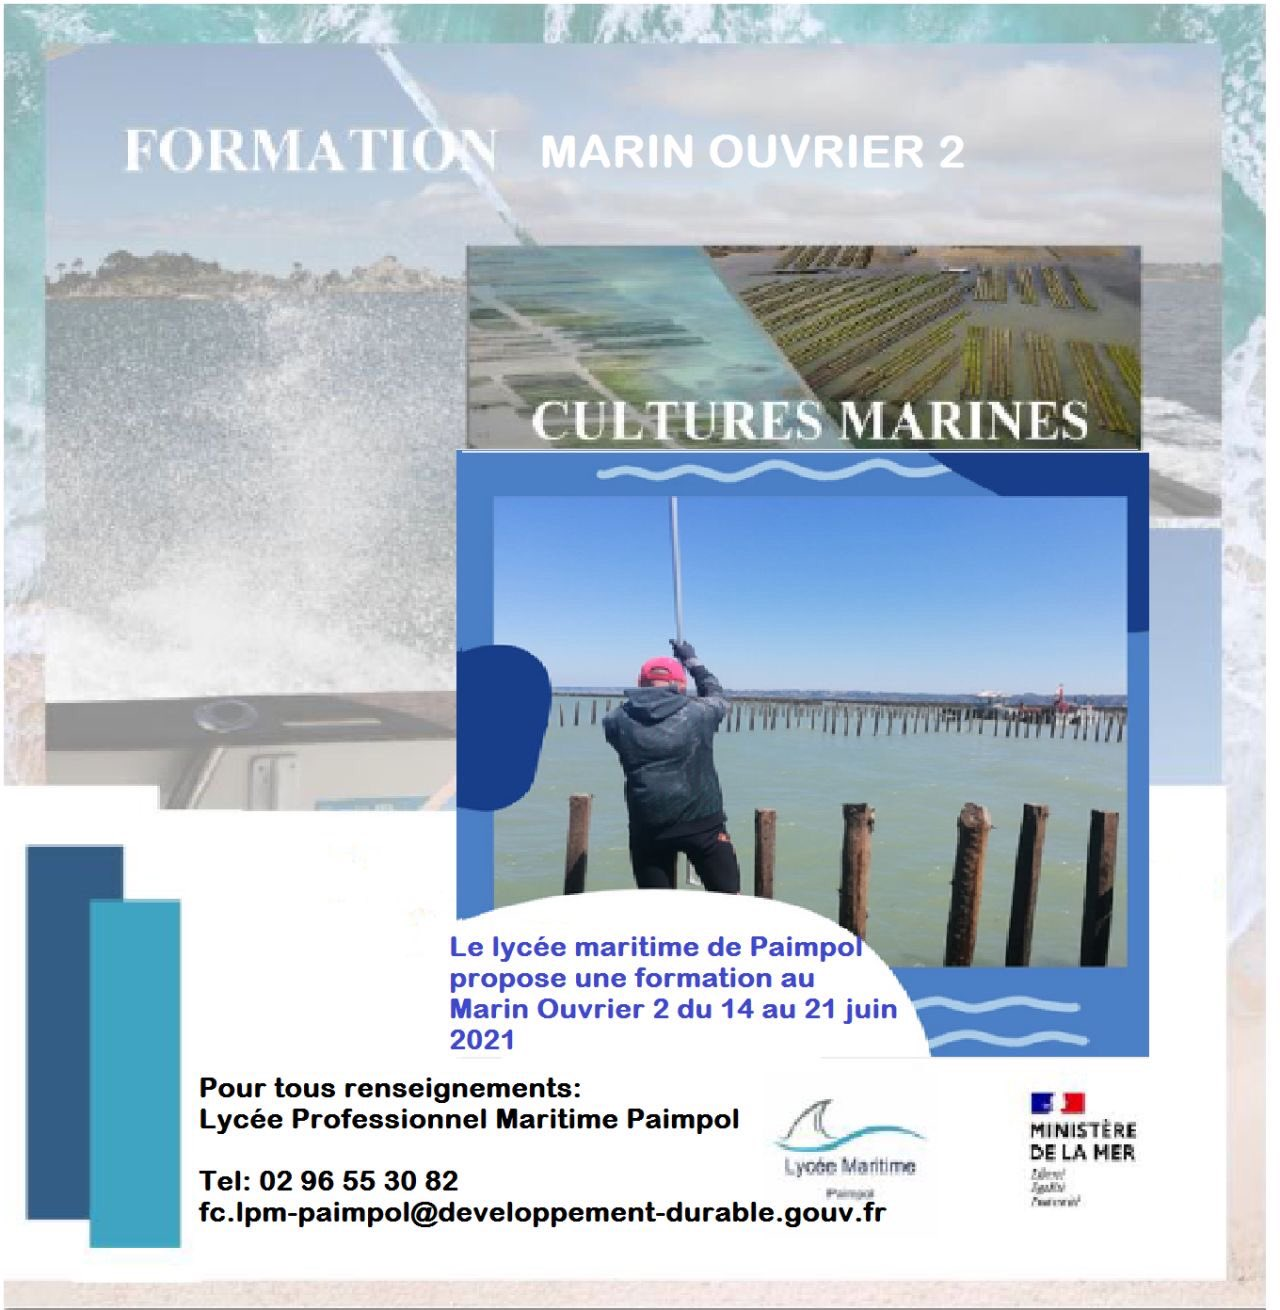 Lycée Maritime cover image